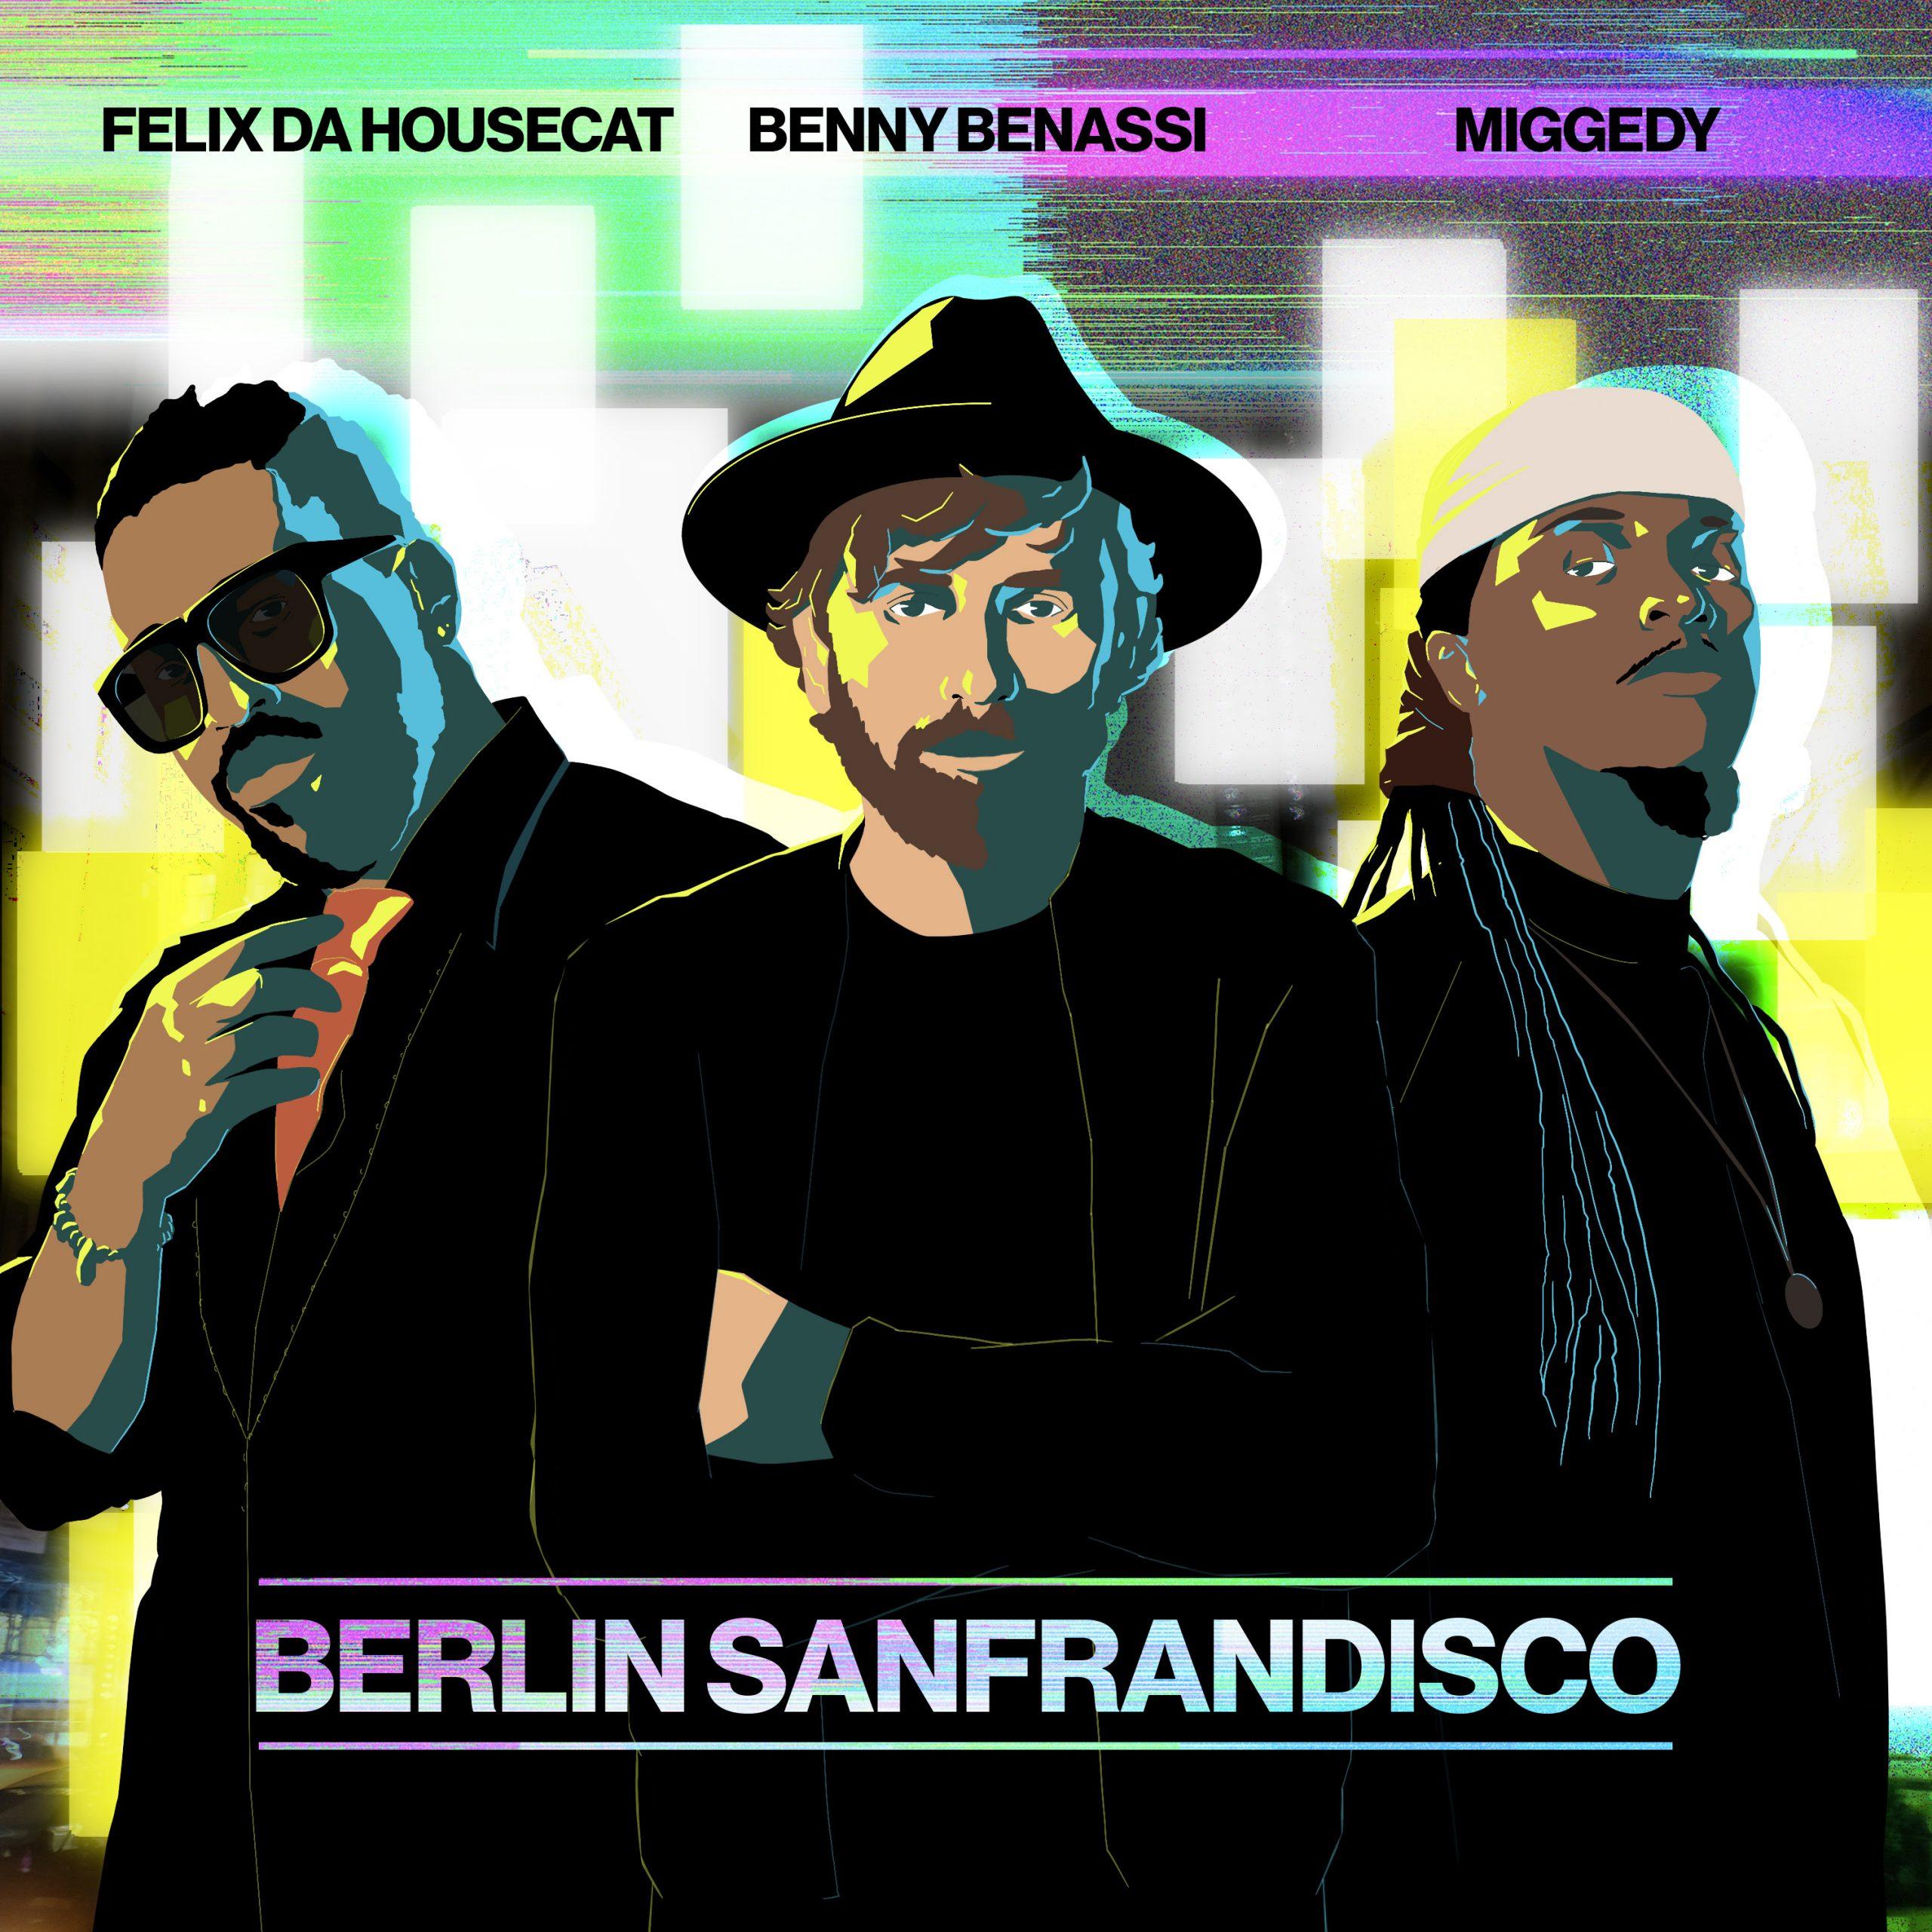 Benny Benassi Felix Da Housecat Miggedy BerlinSanfrandisco